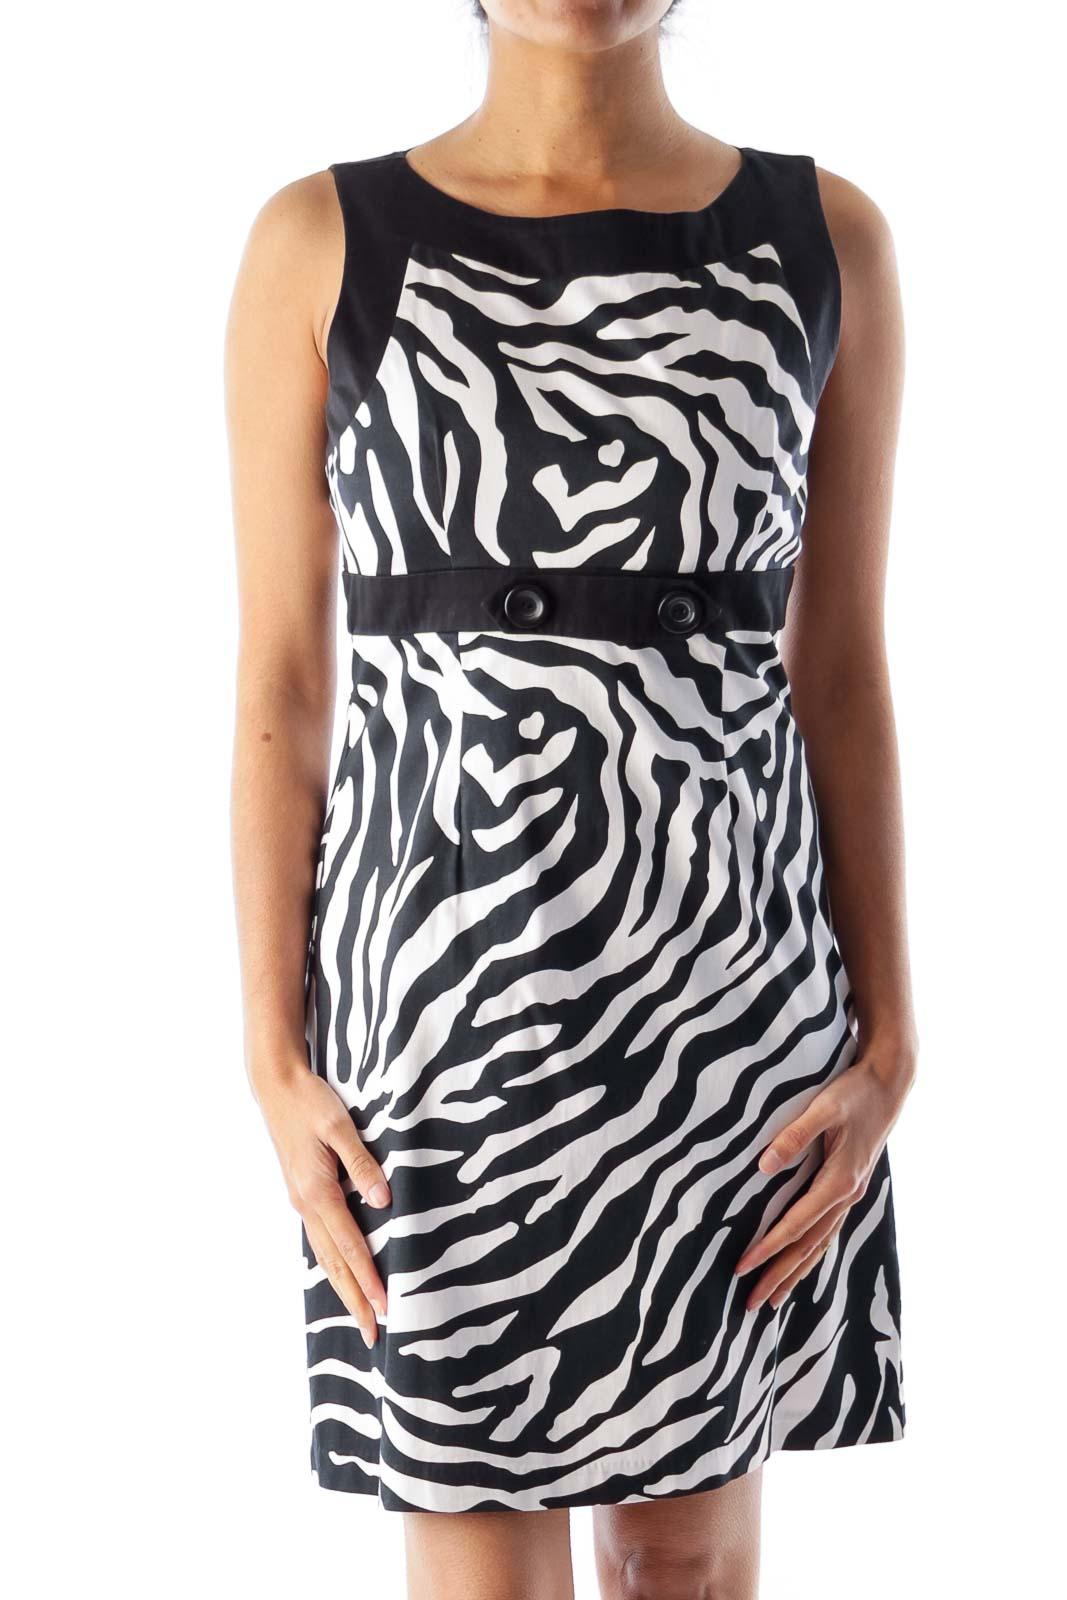 B&W Animal Print Dress Front